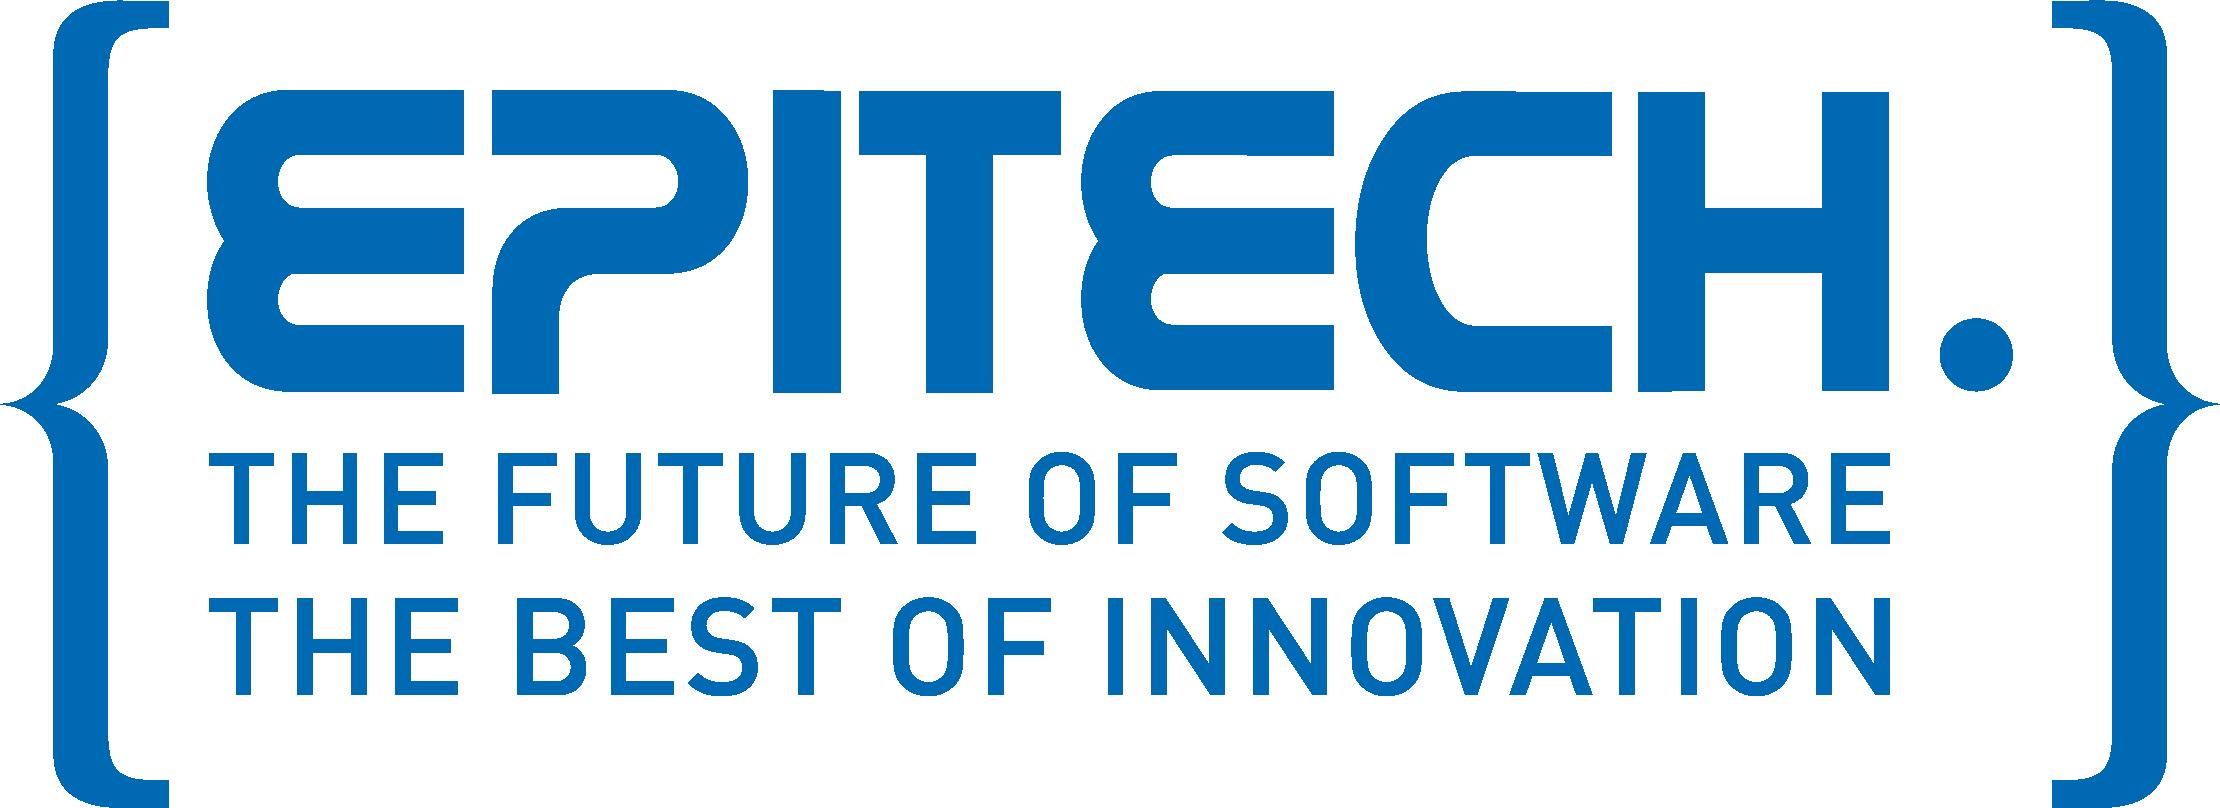 epitech-logo-quadri-baseline-anglais